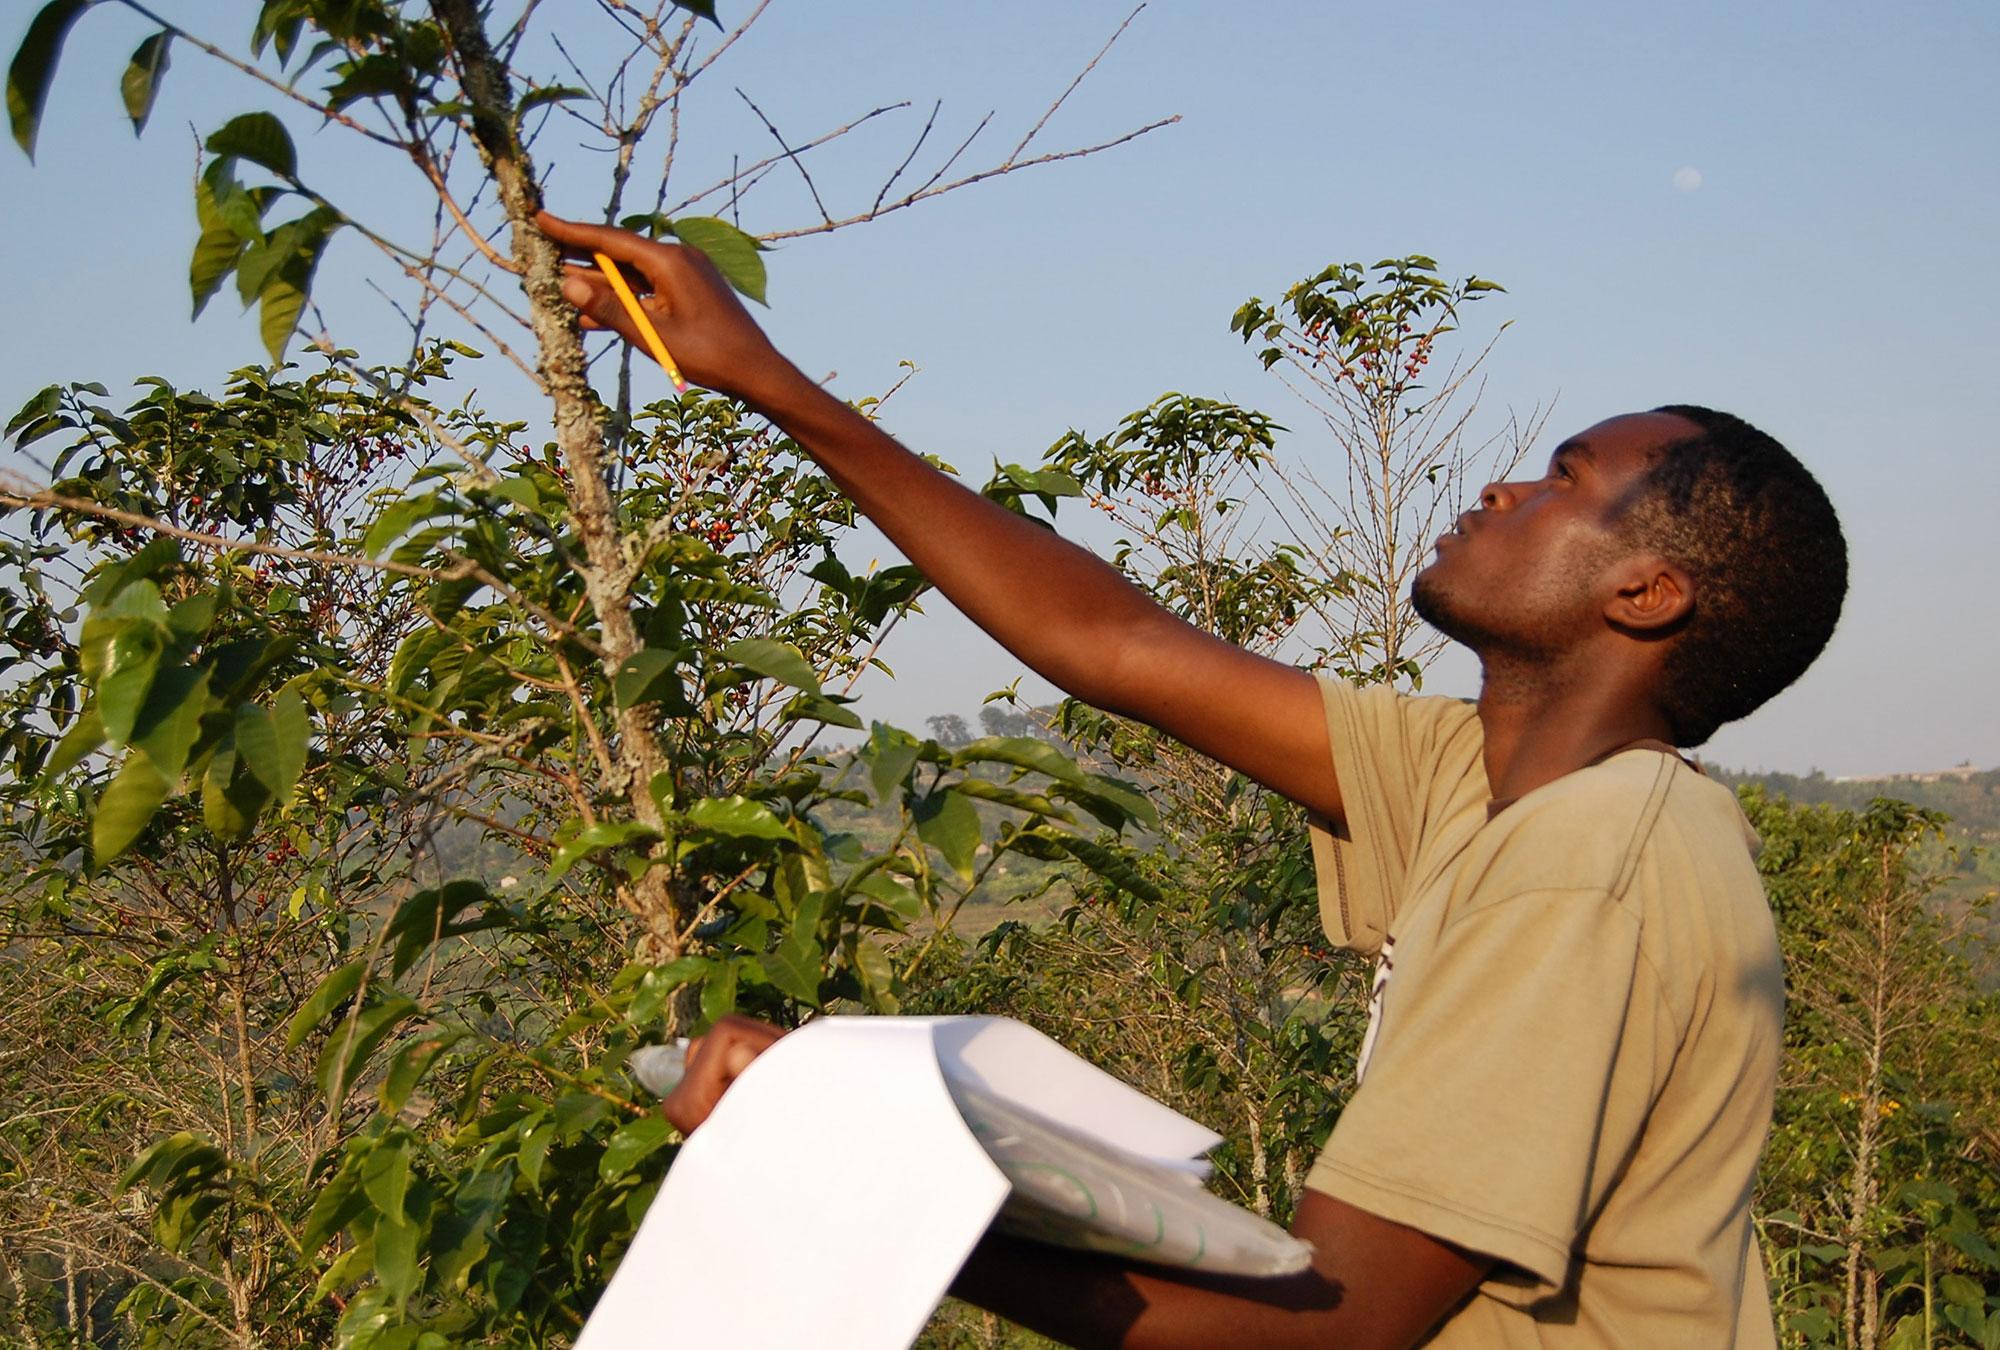 Surveyor inspecting a coffee plant in rural Rwanda